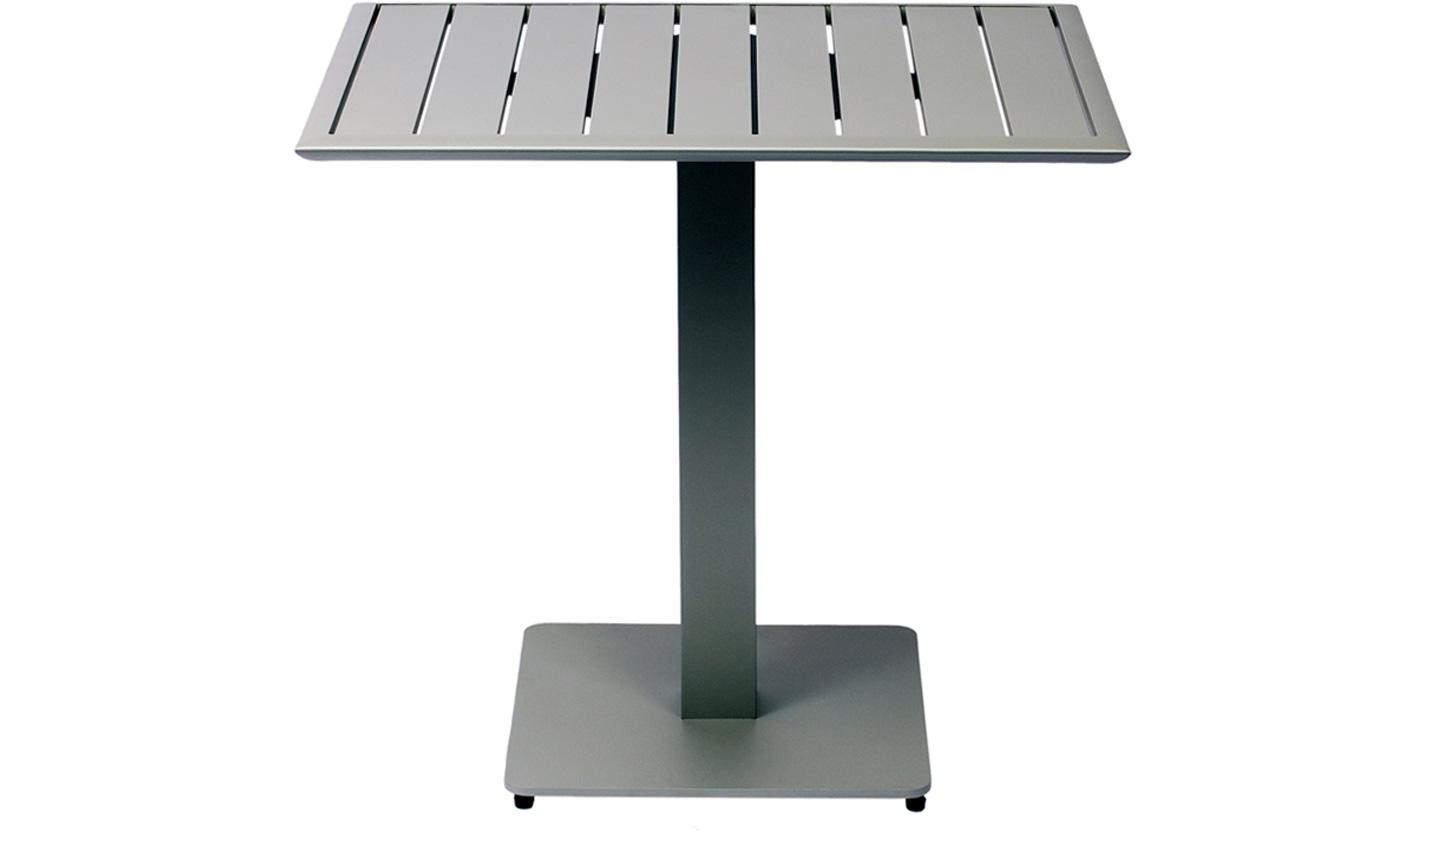 SOUTHBEACH-TABLE-BFM-2.jpg